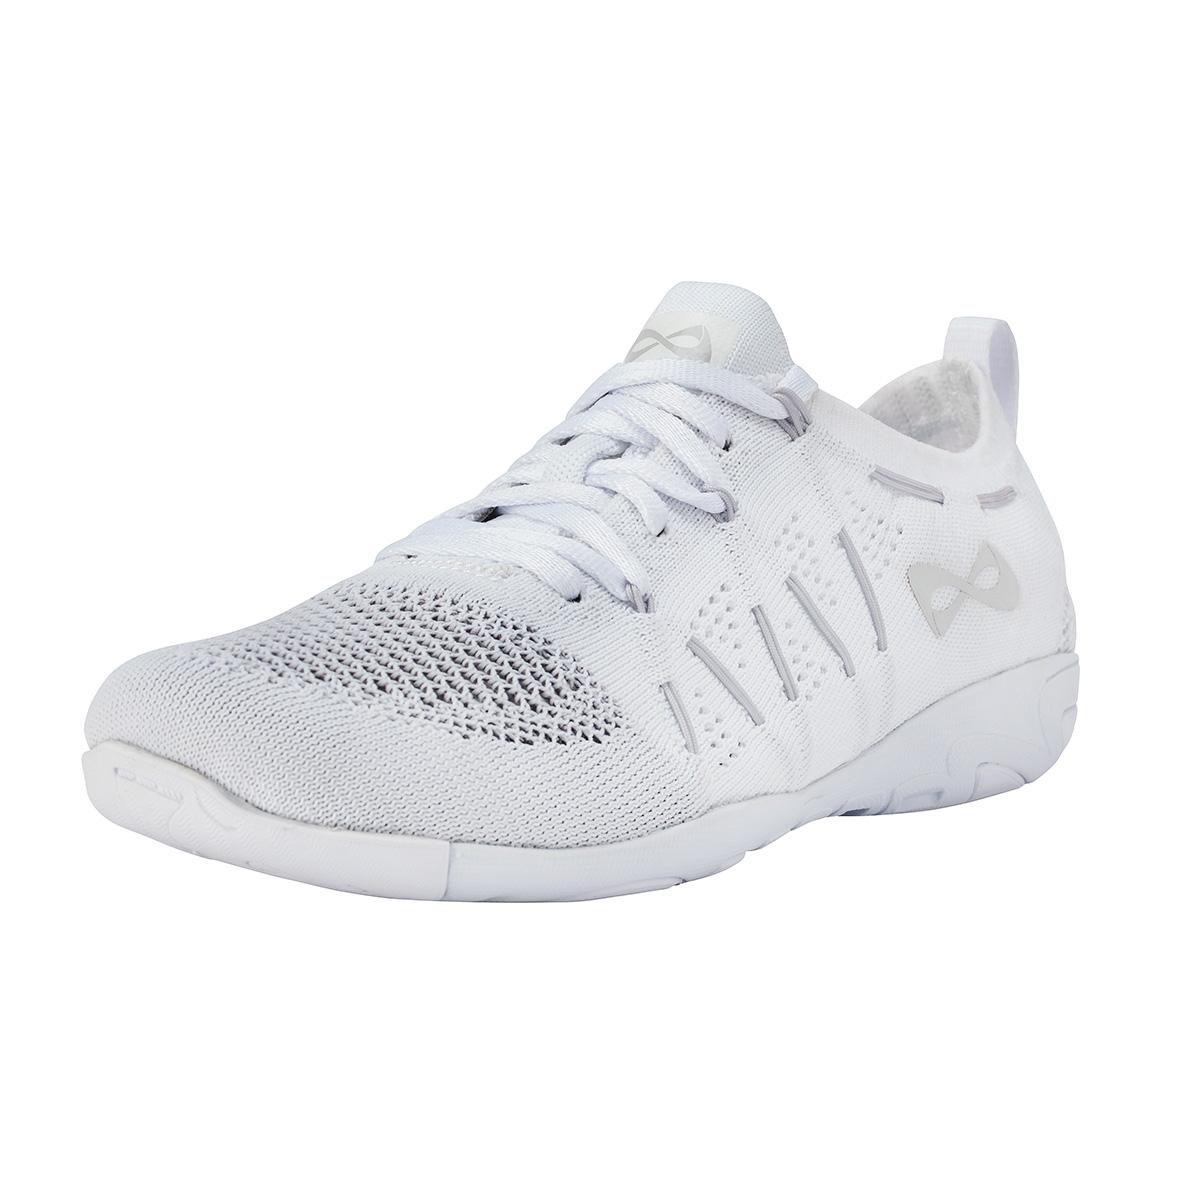 Nfinity Flyte Shoe - White